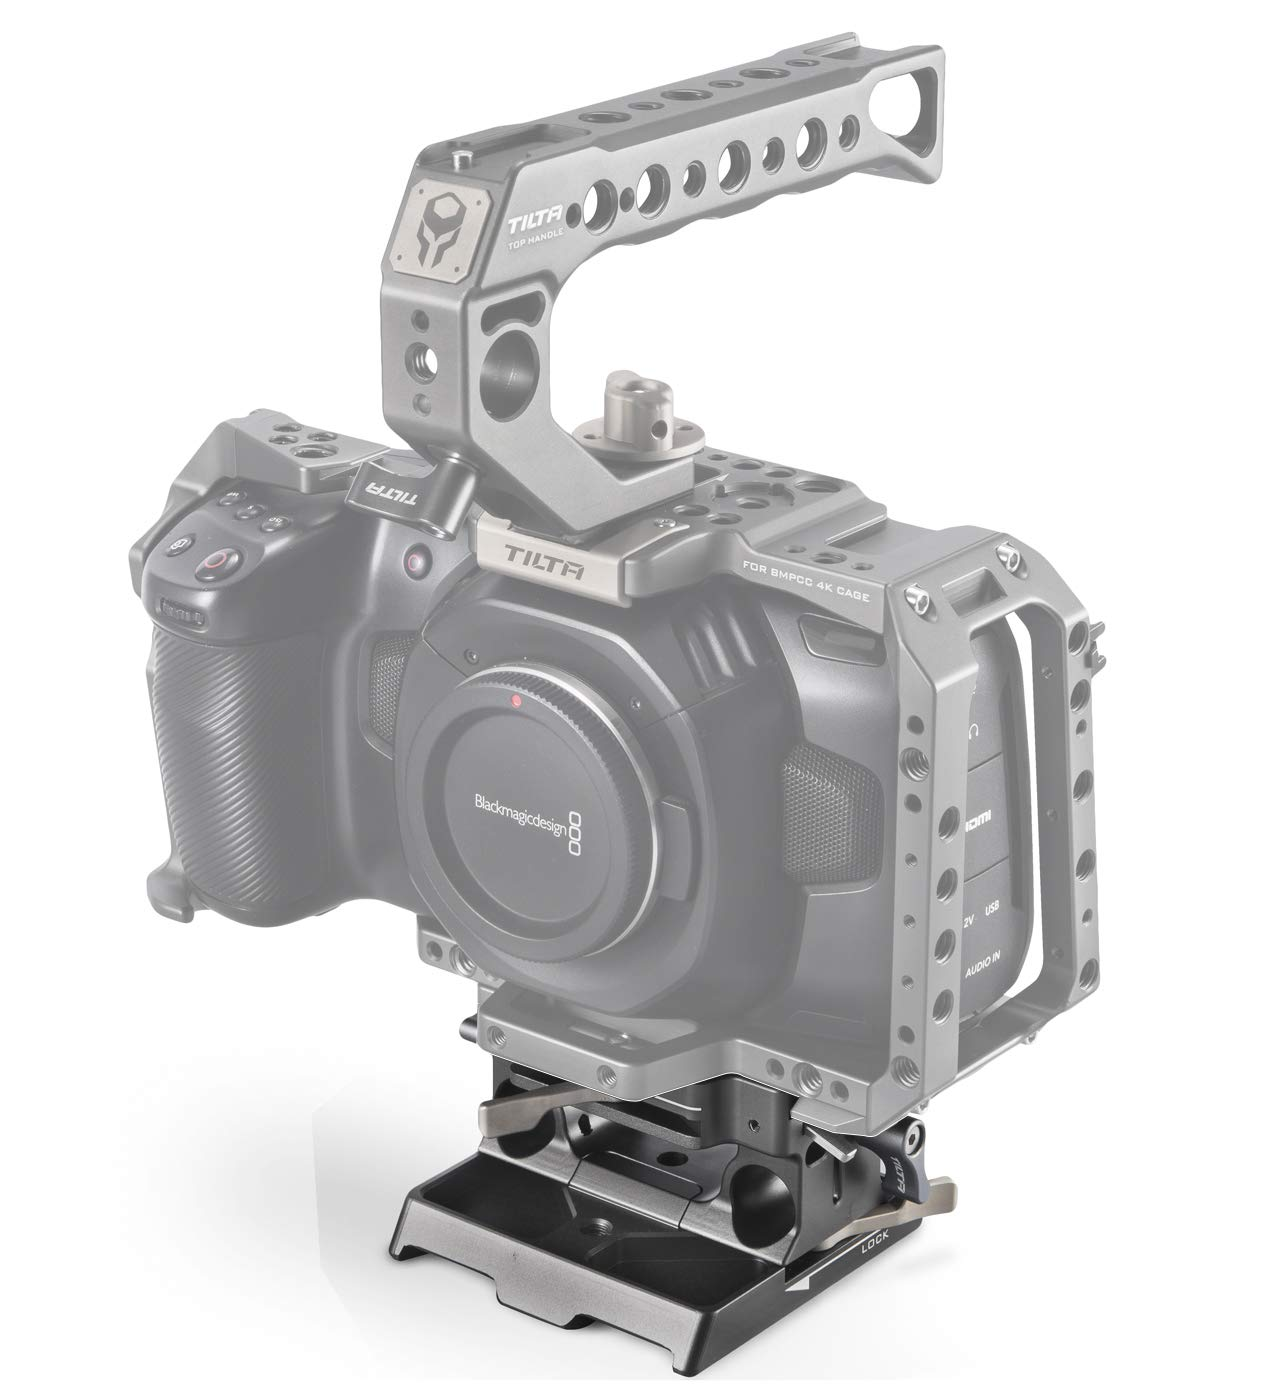 TILTA TA-SSDH-T5 T5 SSD Drive Cover for BMPCC 4K Cage Blackmagic Pocket Cinema Camera 4K Rig Tilta Gray